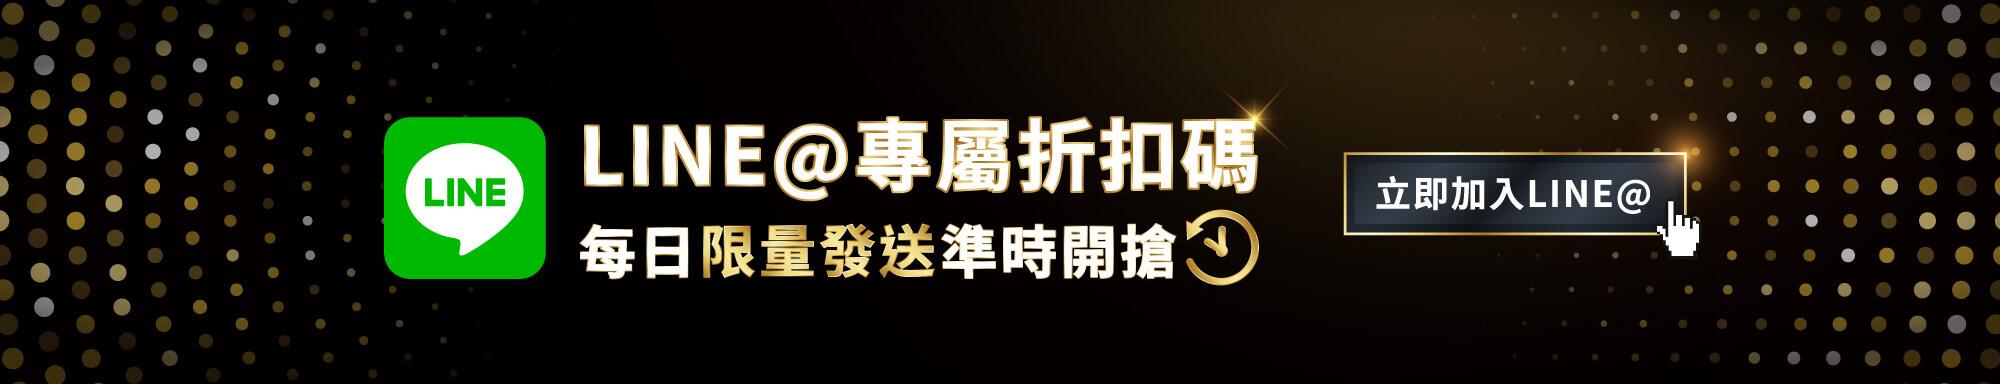 jerscy,LINE@,LINE官方,加入好友,1111活動